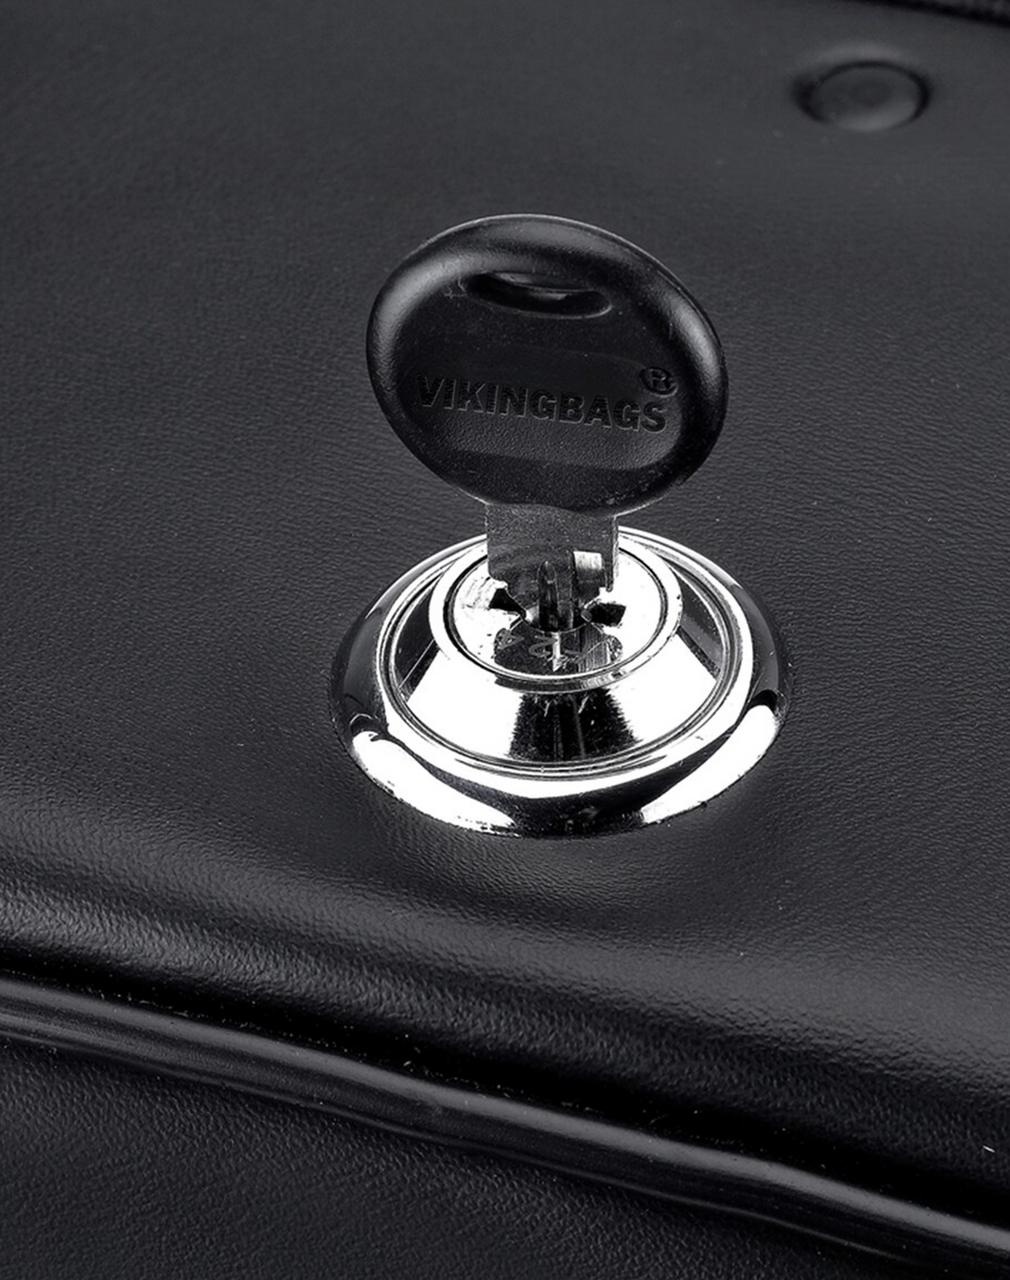 Honda 1500 Valkyrie Standard Vikingbags Shock Cutout Single Strap Large Slanted Leather Motorcycle Saddlebags Key Lock View